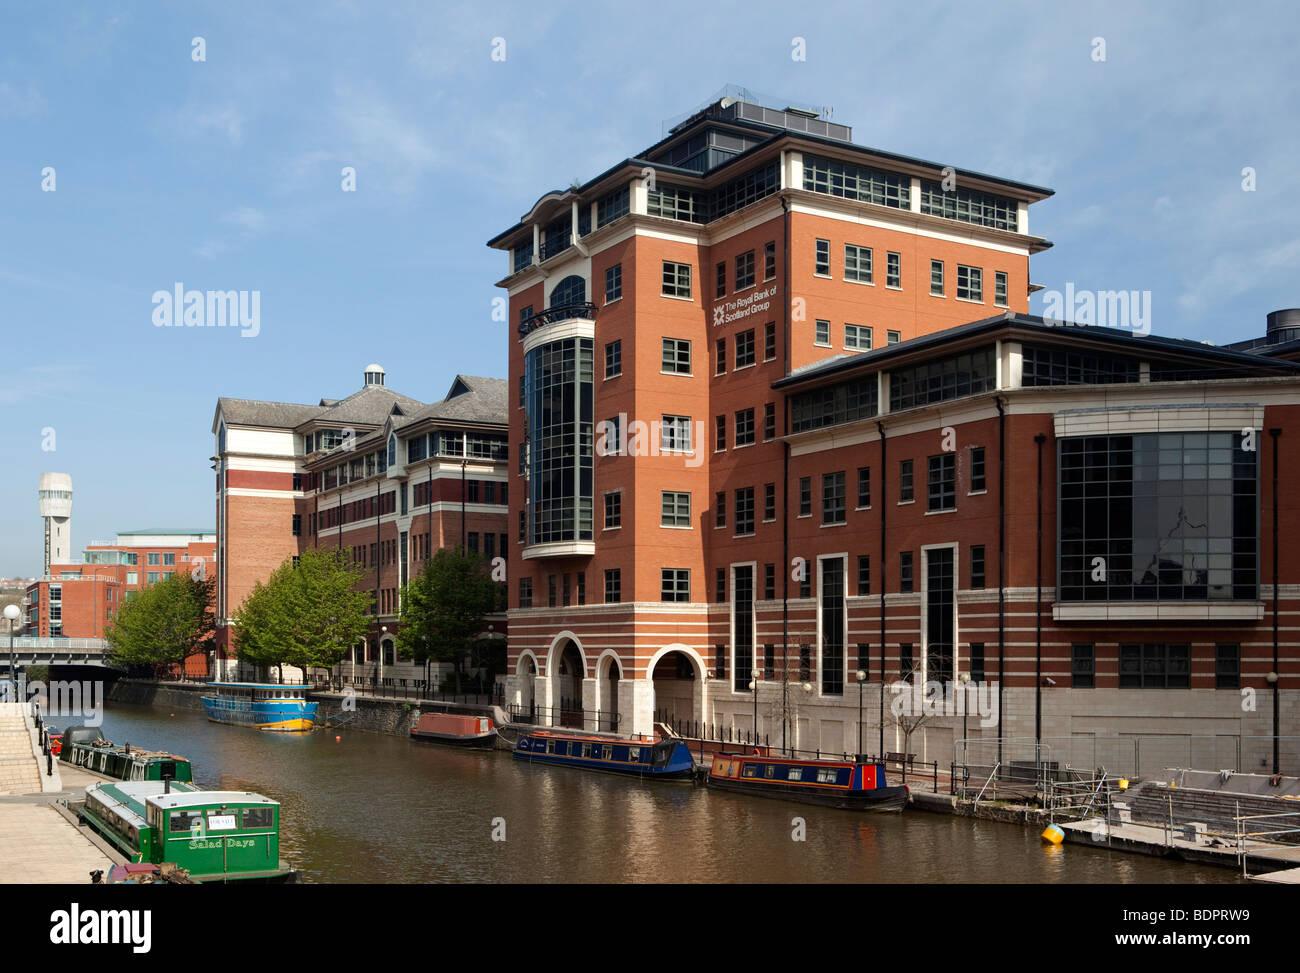 UK, England, Bristol, Temple Quay, River Avon, Royal Bank of Scotland waterfront office - Stock Image